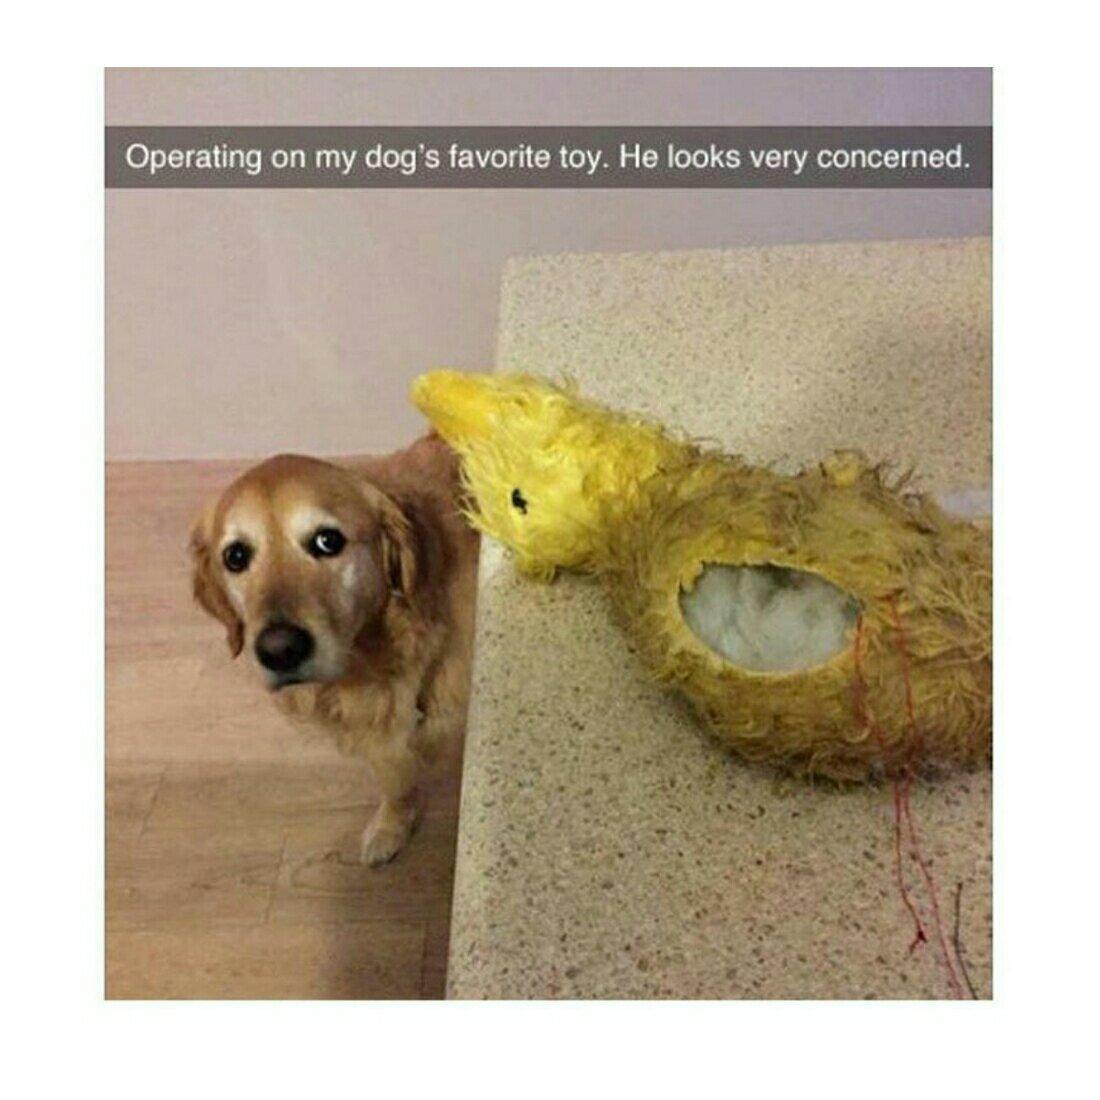 Please tell me mr.duck ll be great again - meme